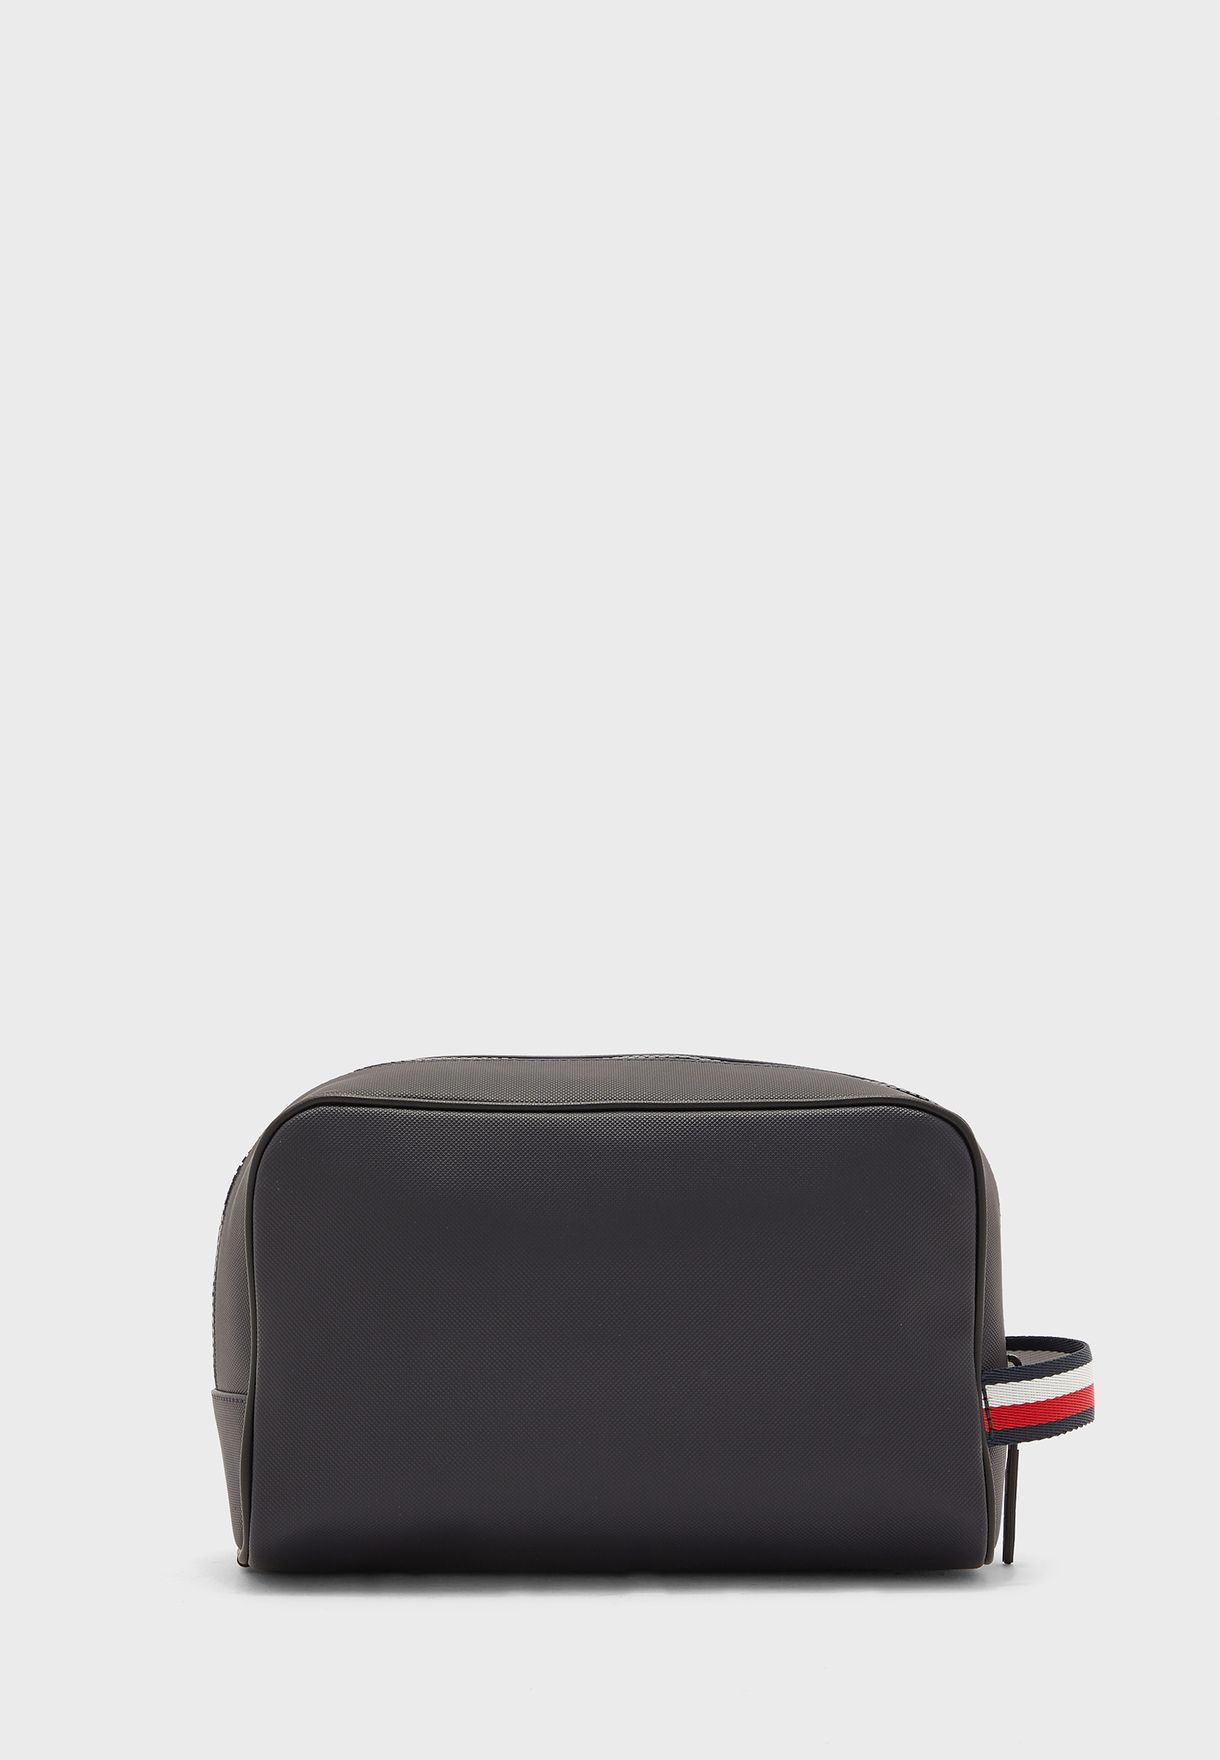 Essential Toiletry Bag